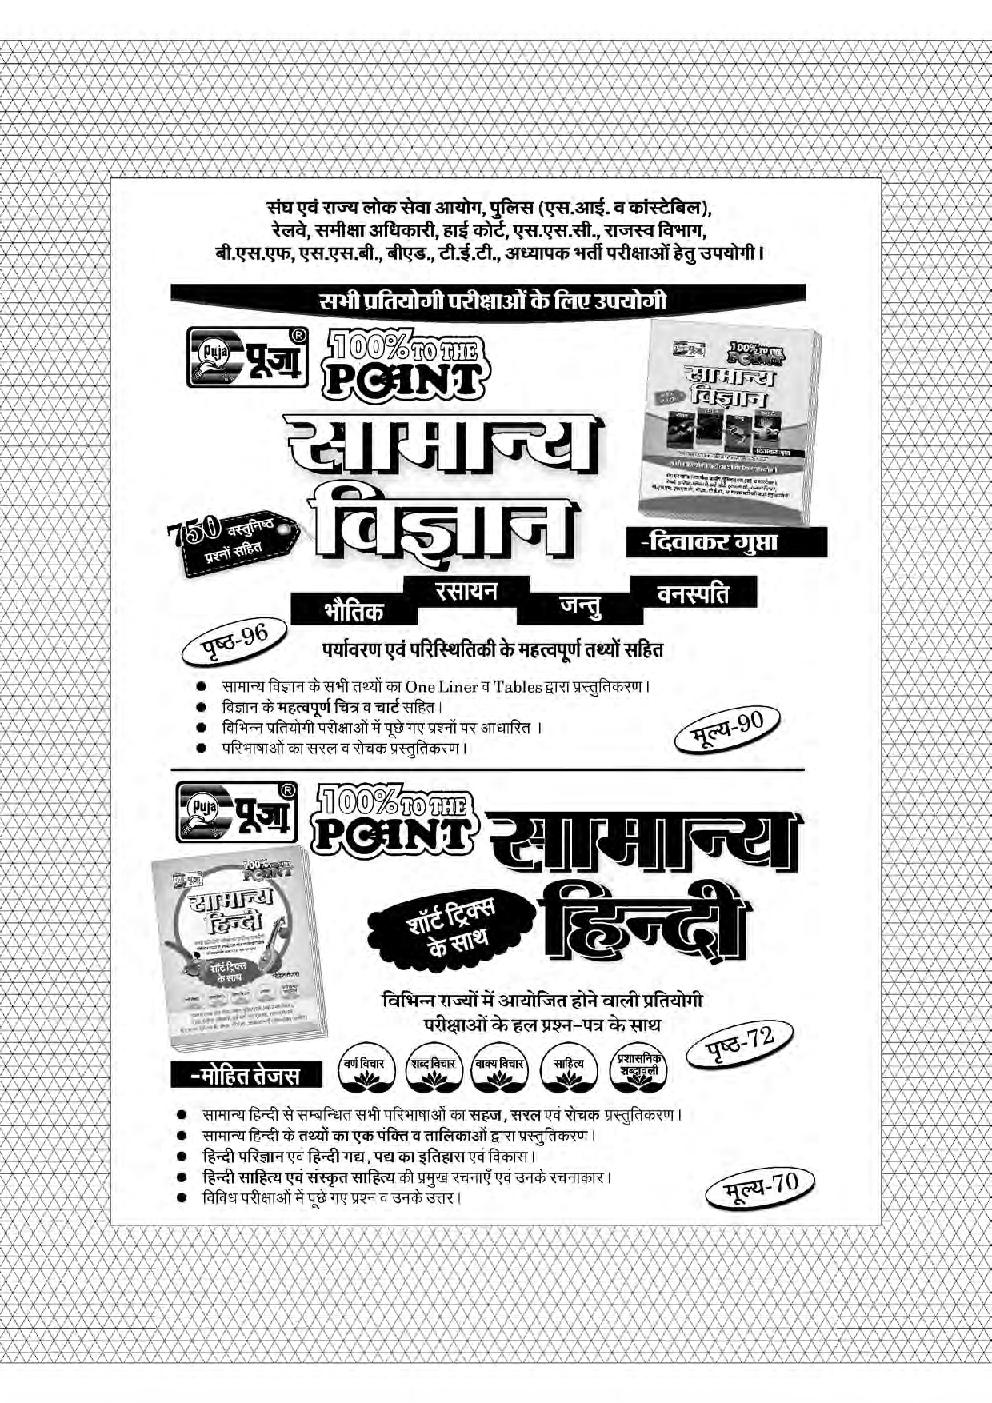 Puja UPSSSC सामान्य ज्ञान (Reminder) - Page 5